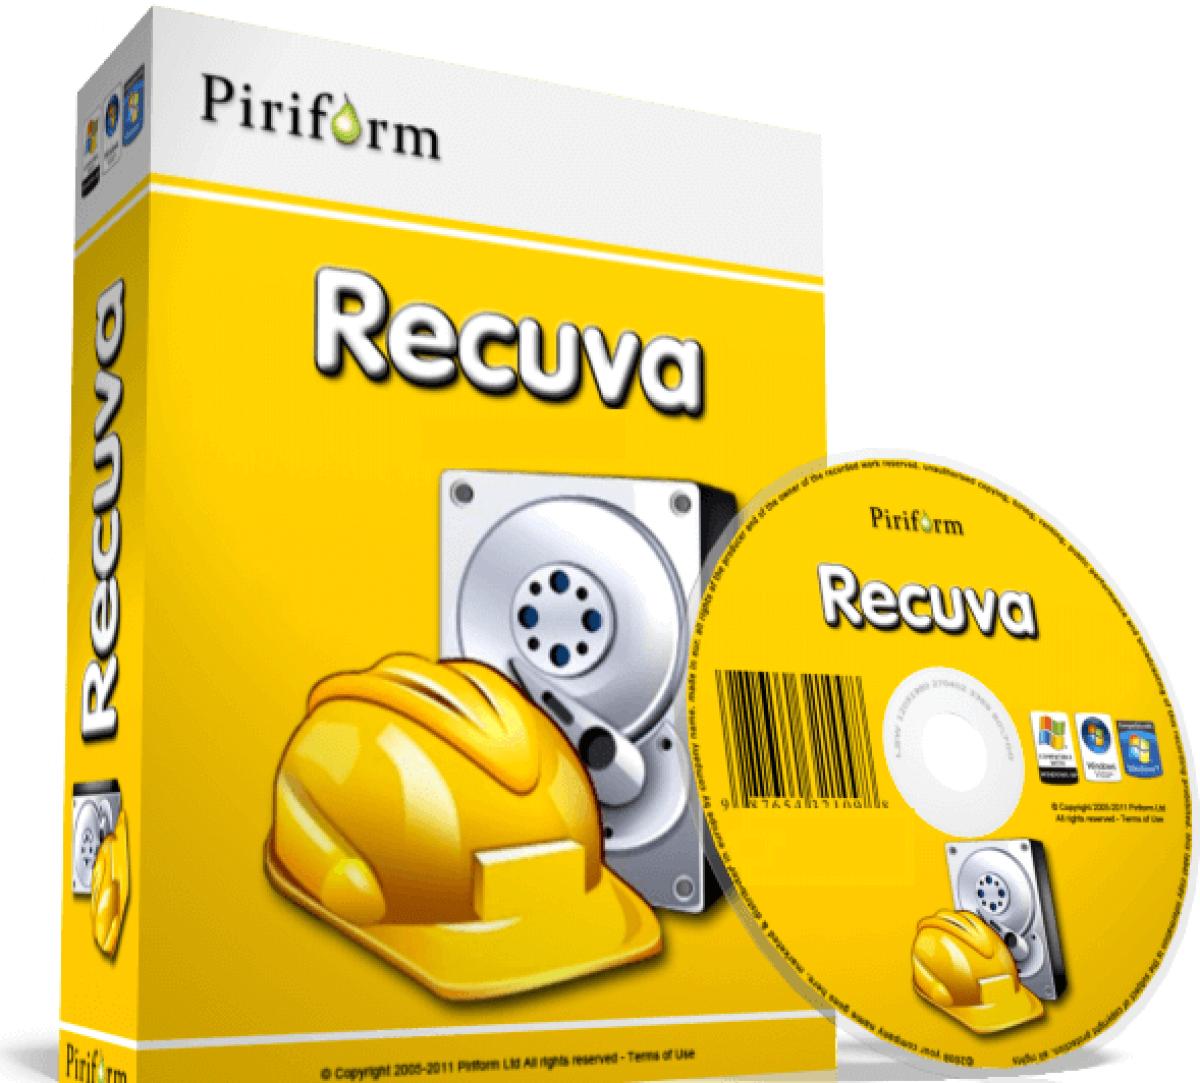 Recuva Pro 1.58 Activator Crack [Keygen + Patch + Portable]